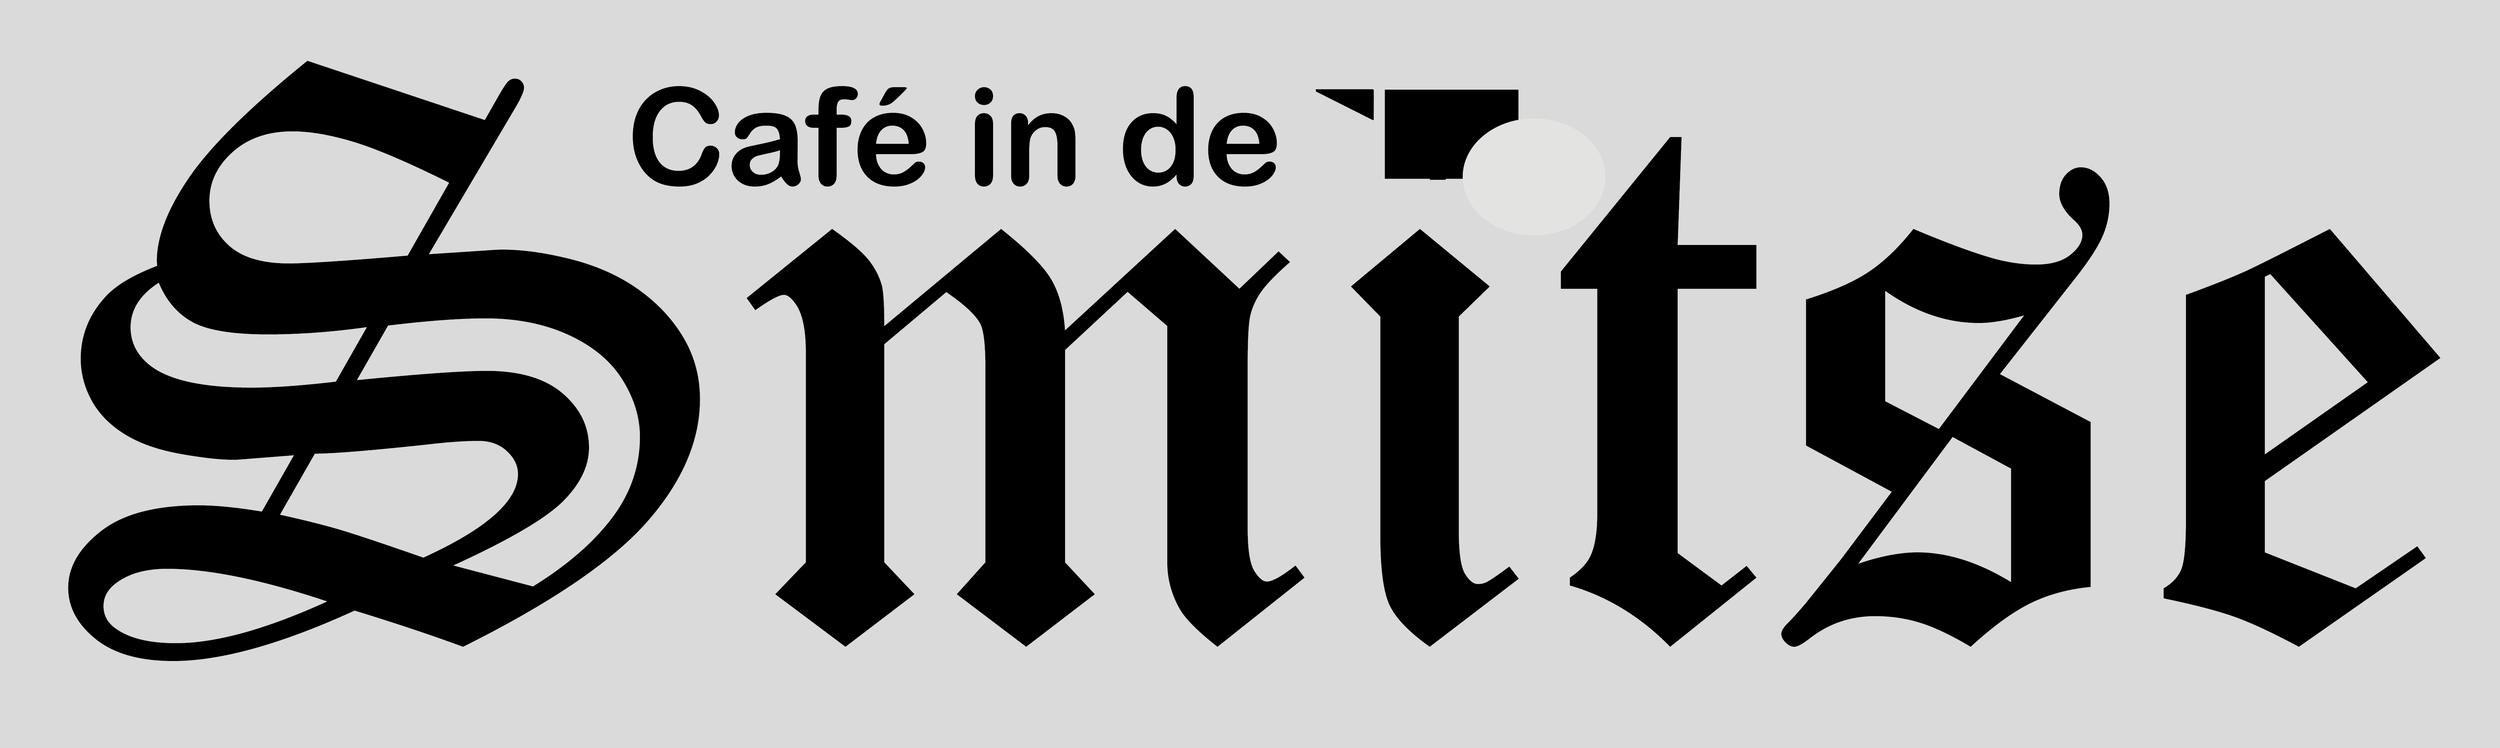 Smitse logo grijs.png